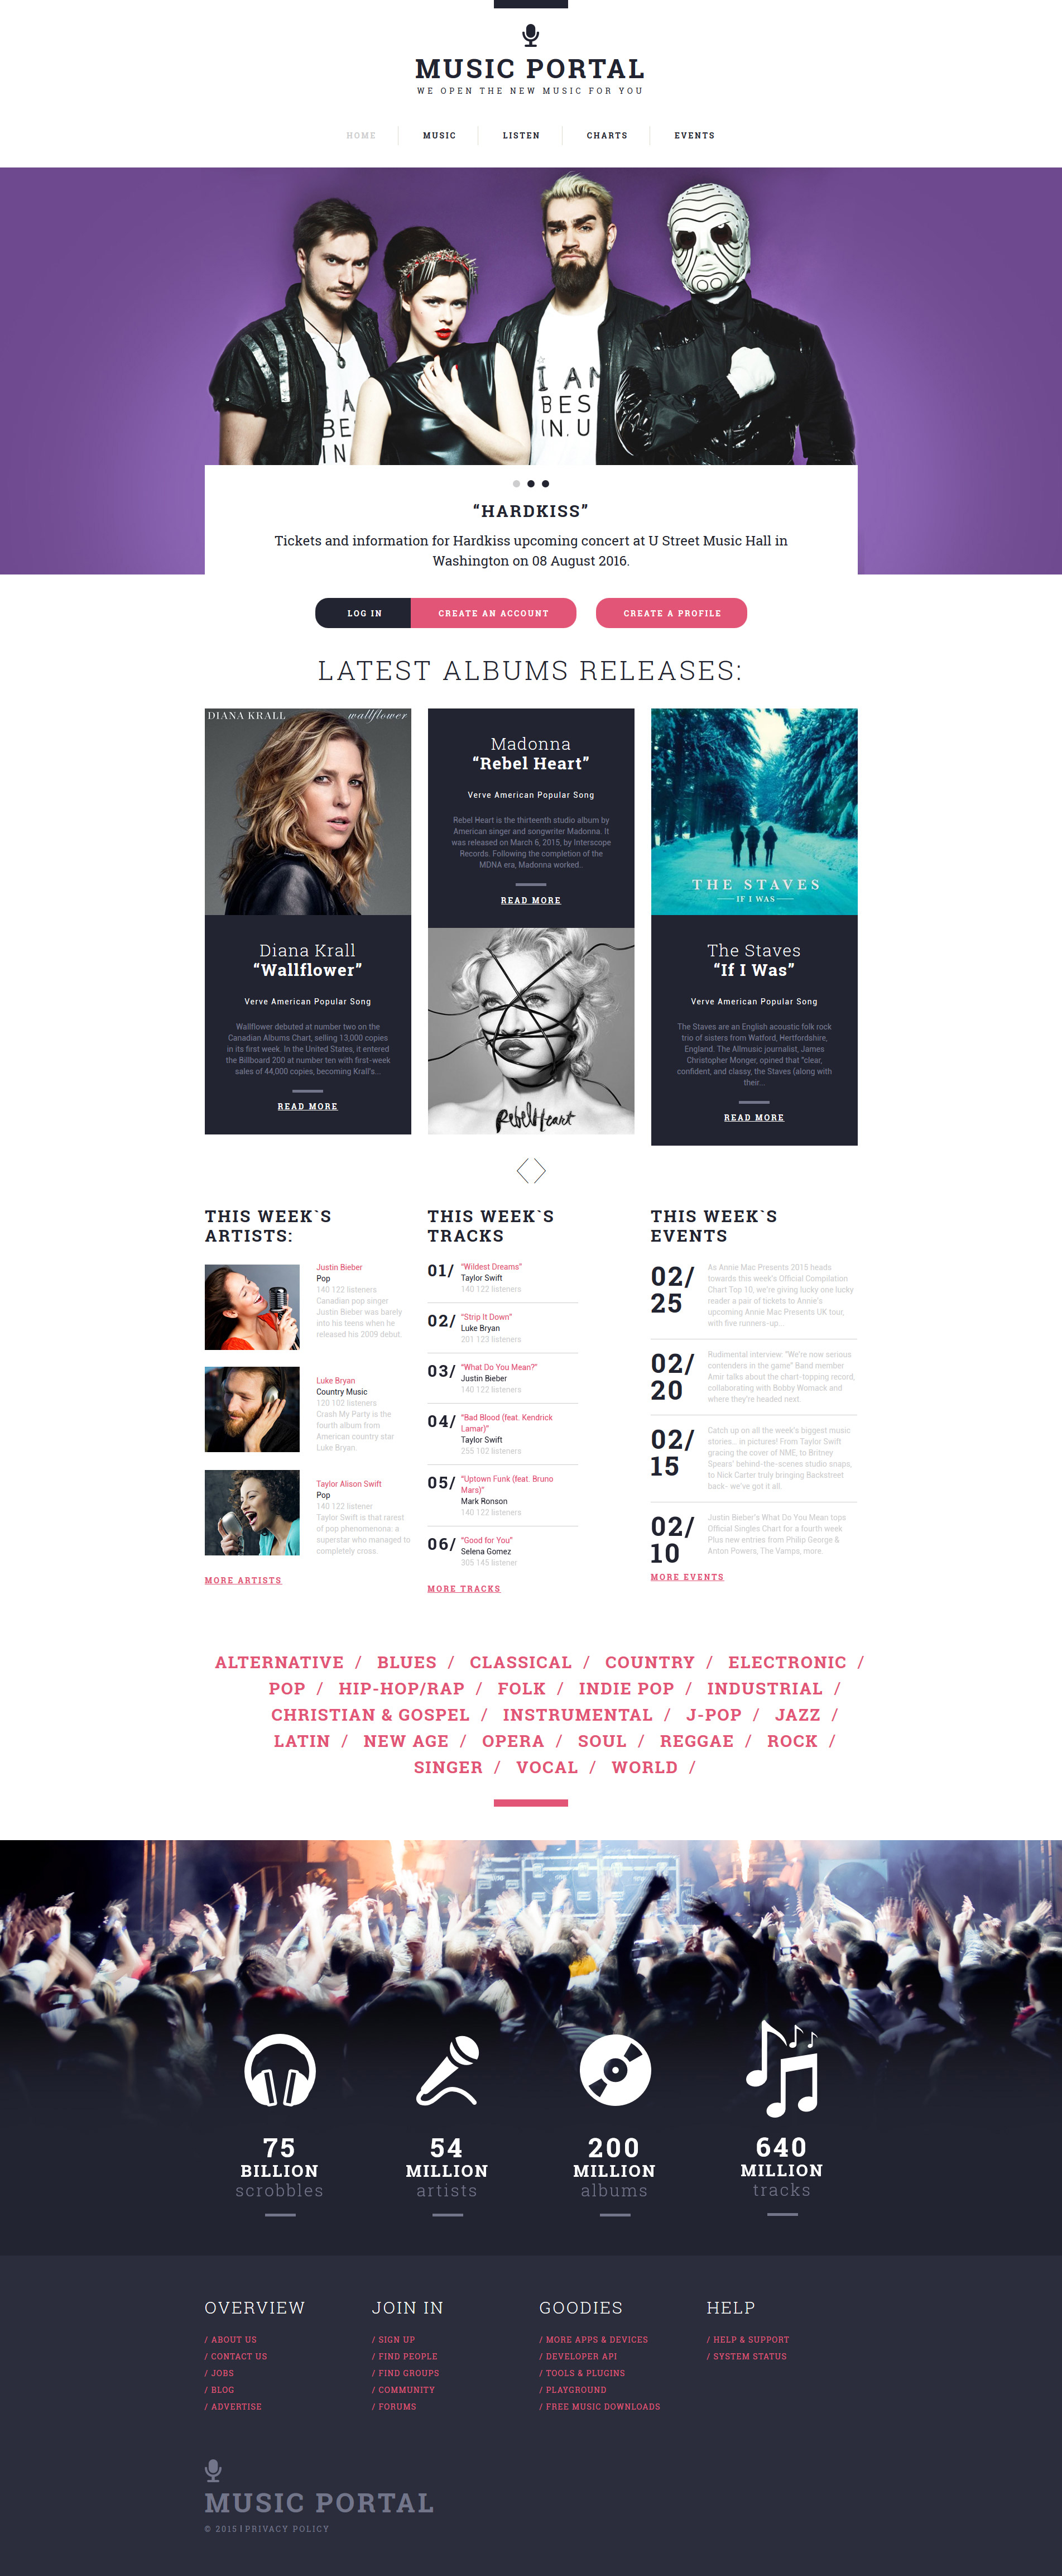 Plantilla Web Responsive para Sitio de Portal de Música #55566 - captura de pantalla